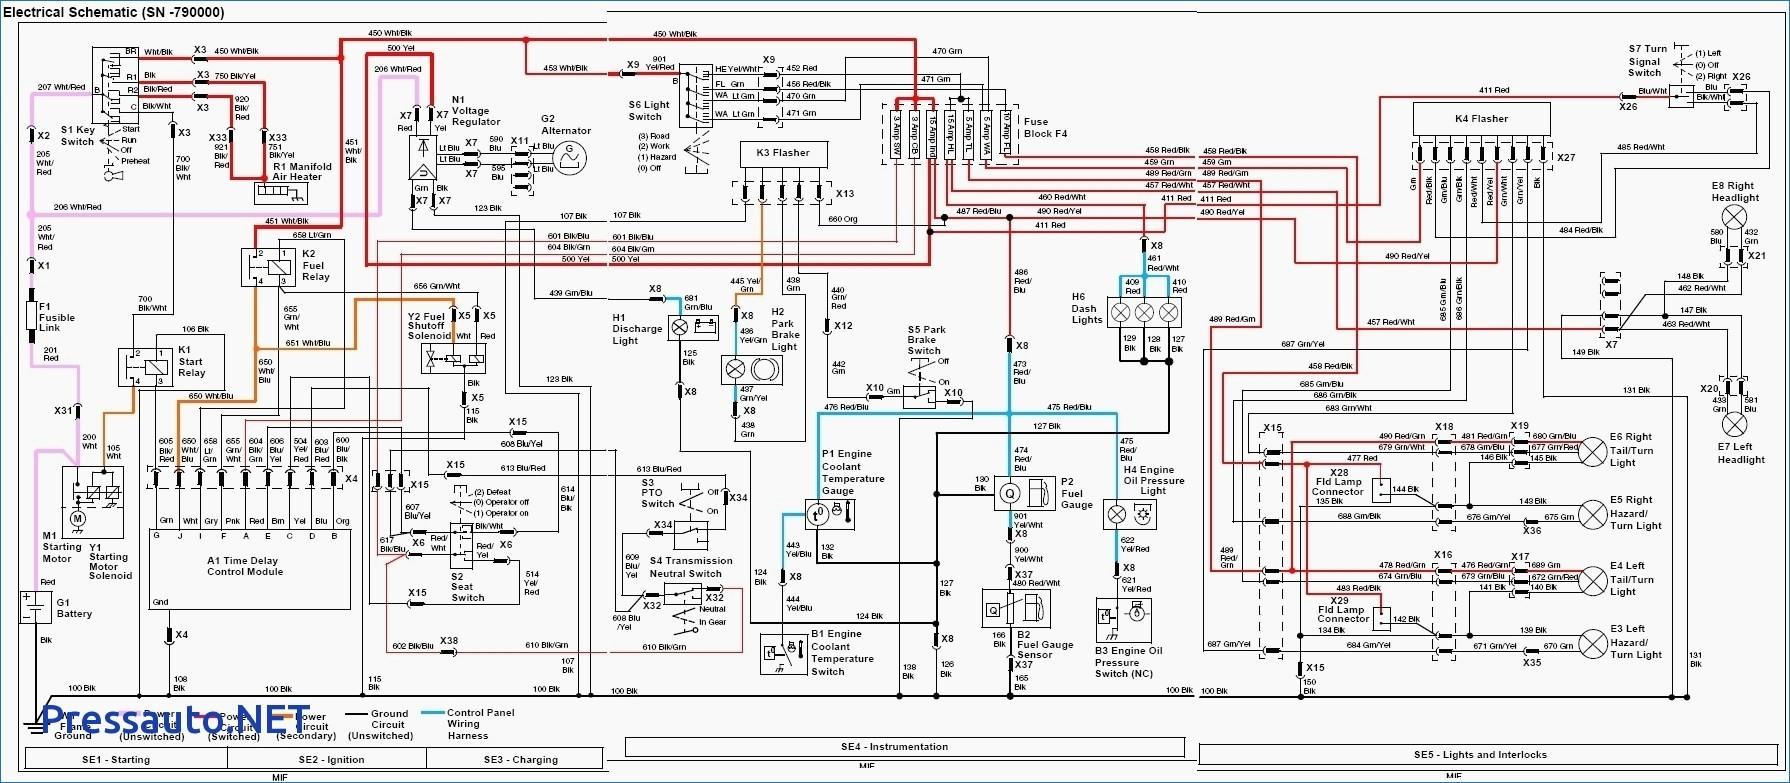 wiring diagram john deere la135 scheme online wiring diagram. Black Bedroom Furniture Sets. Home Design Ideas